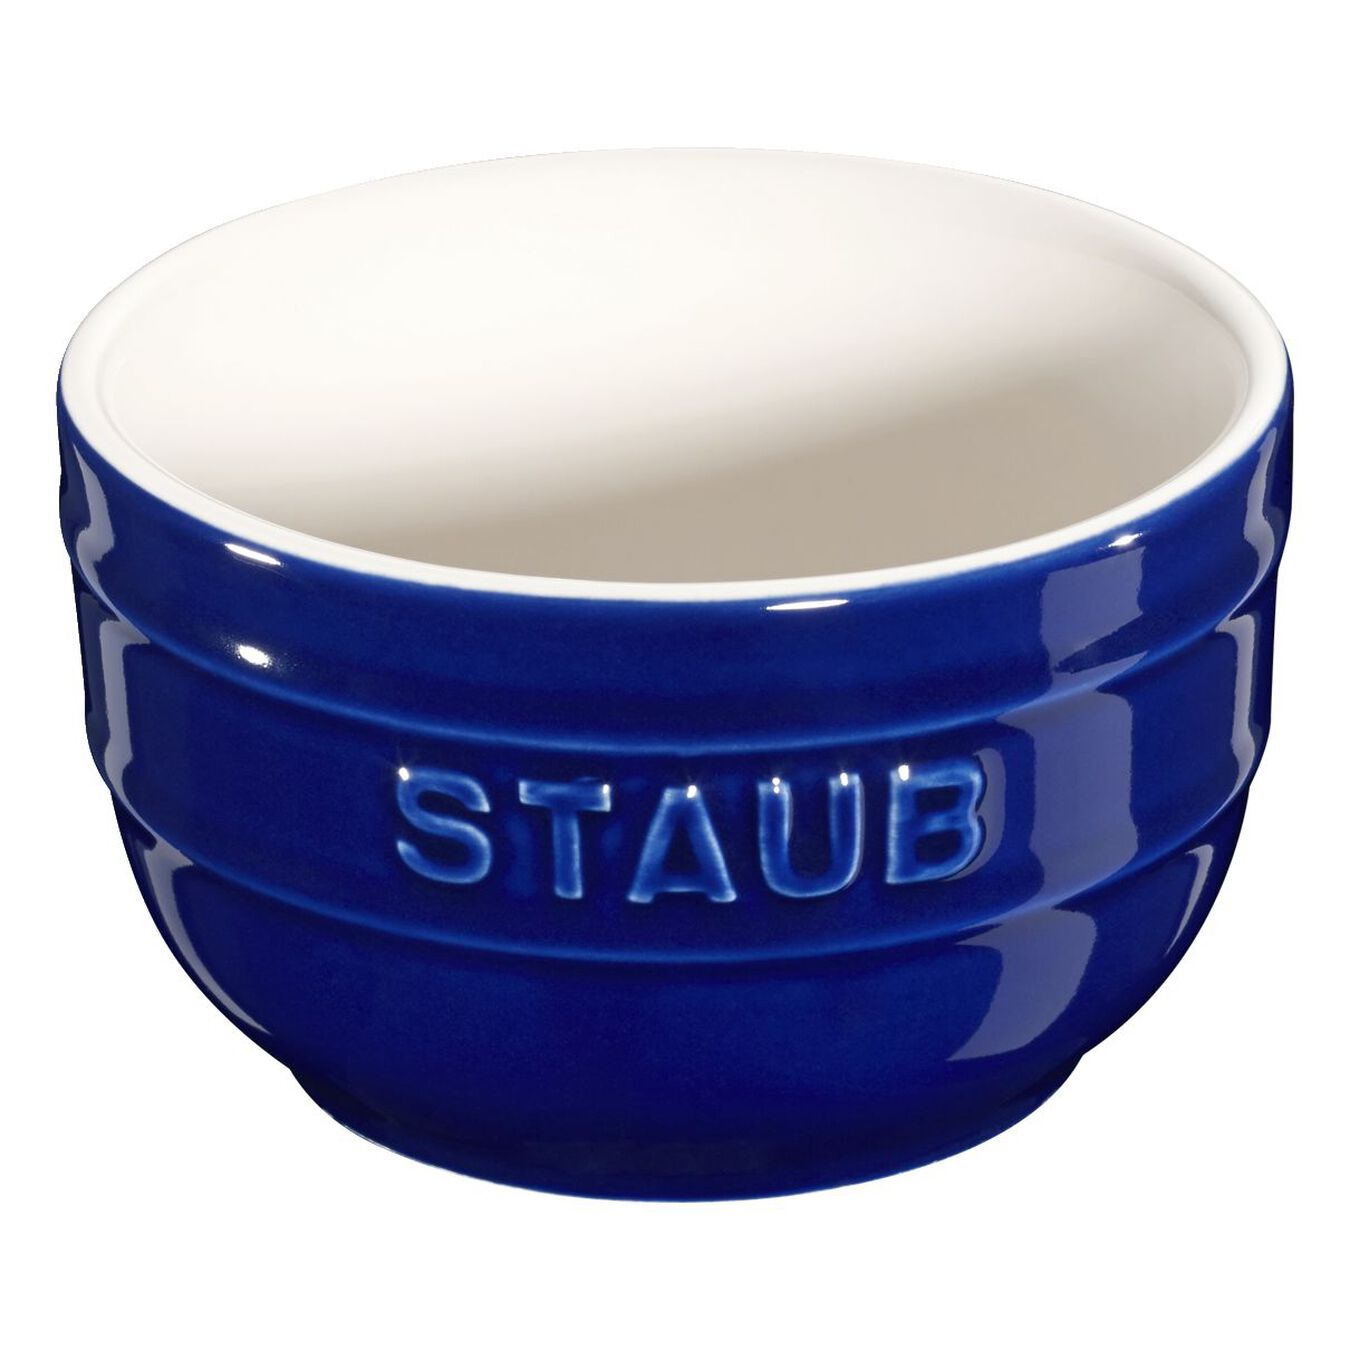 2-pcs Ceramic round Jeu de ramequins, Dark-Blue,,large 1